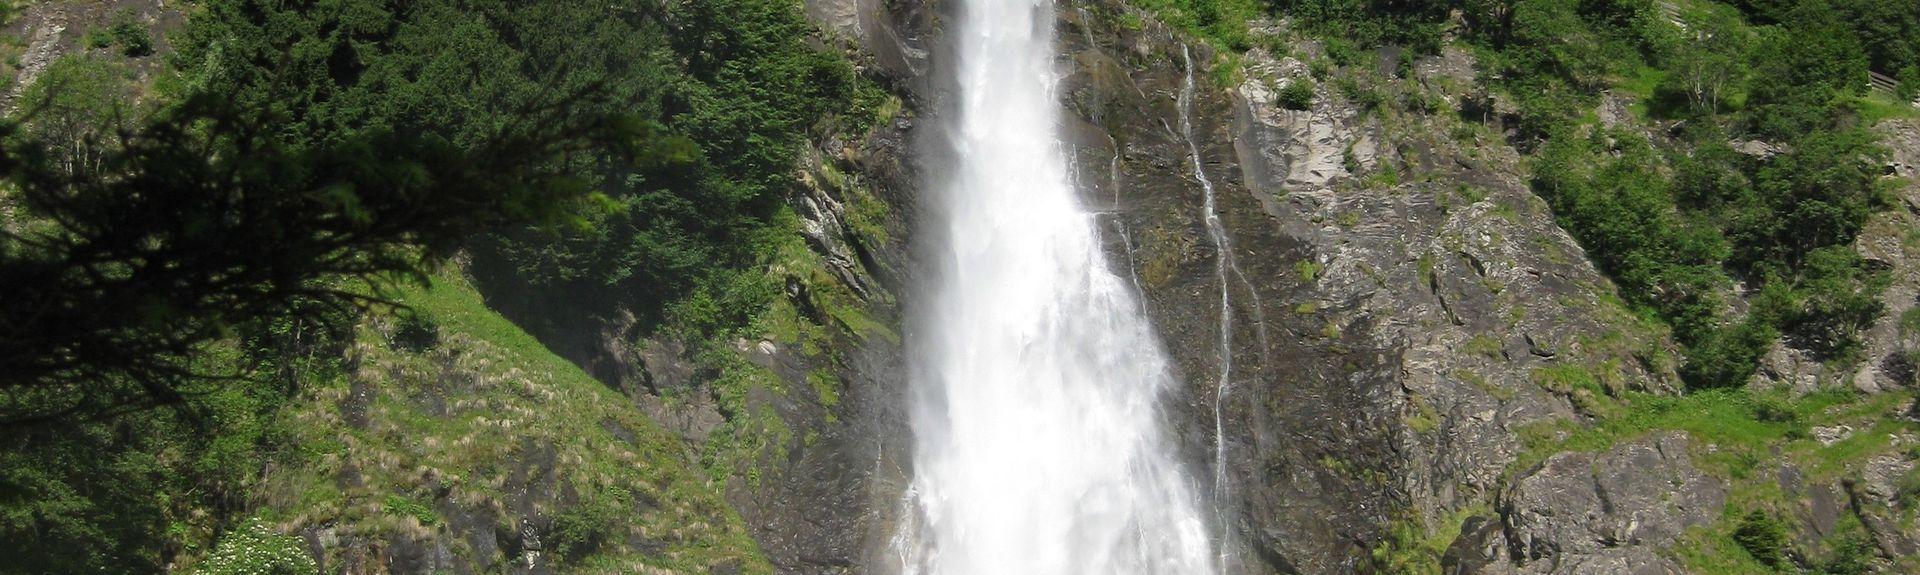 Moso in Passiria, Trentino-Alto Adige, Italy